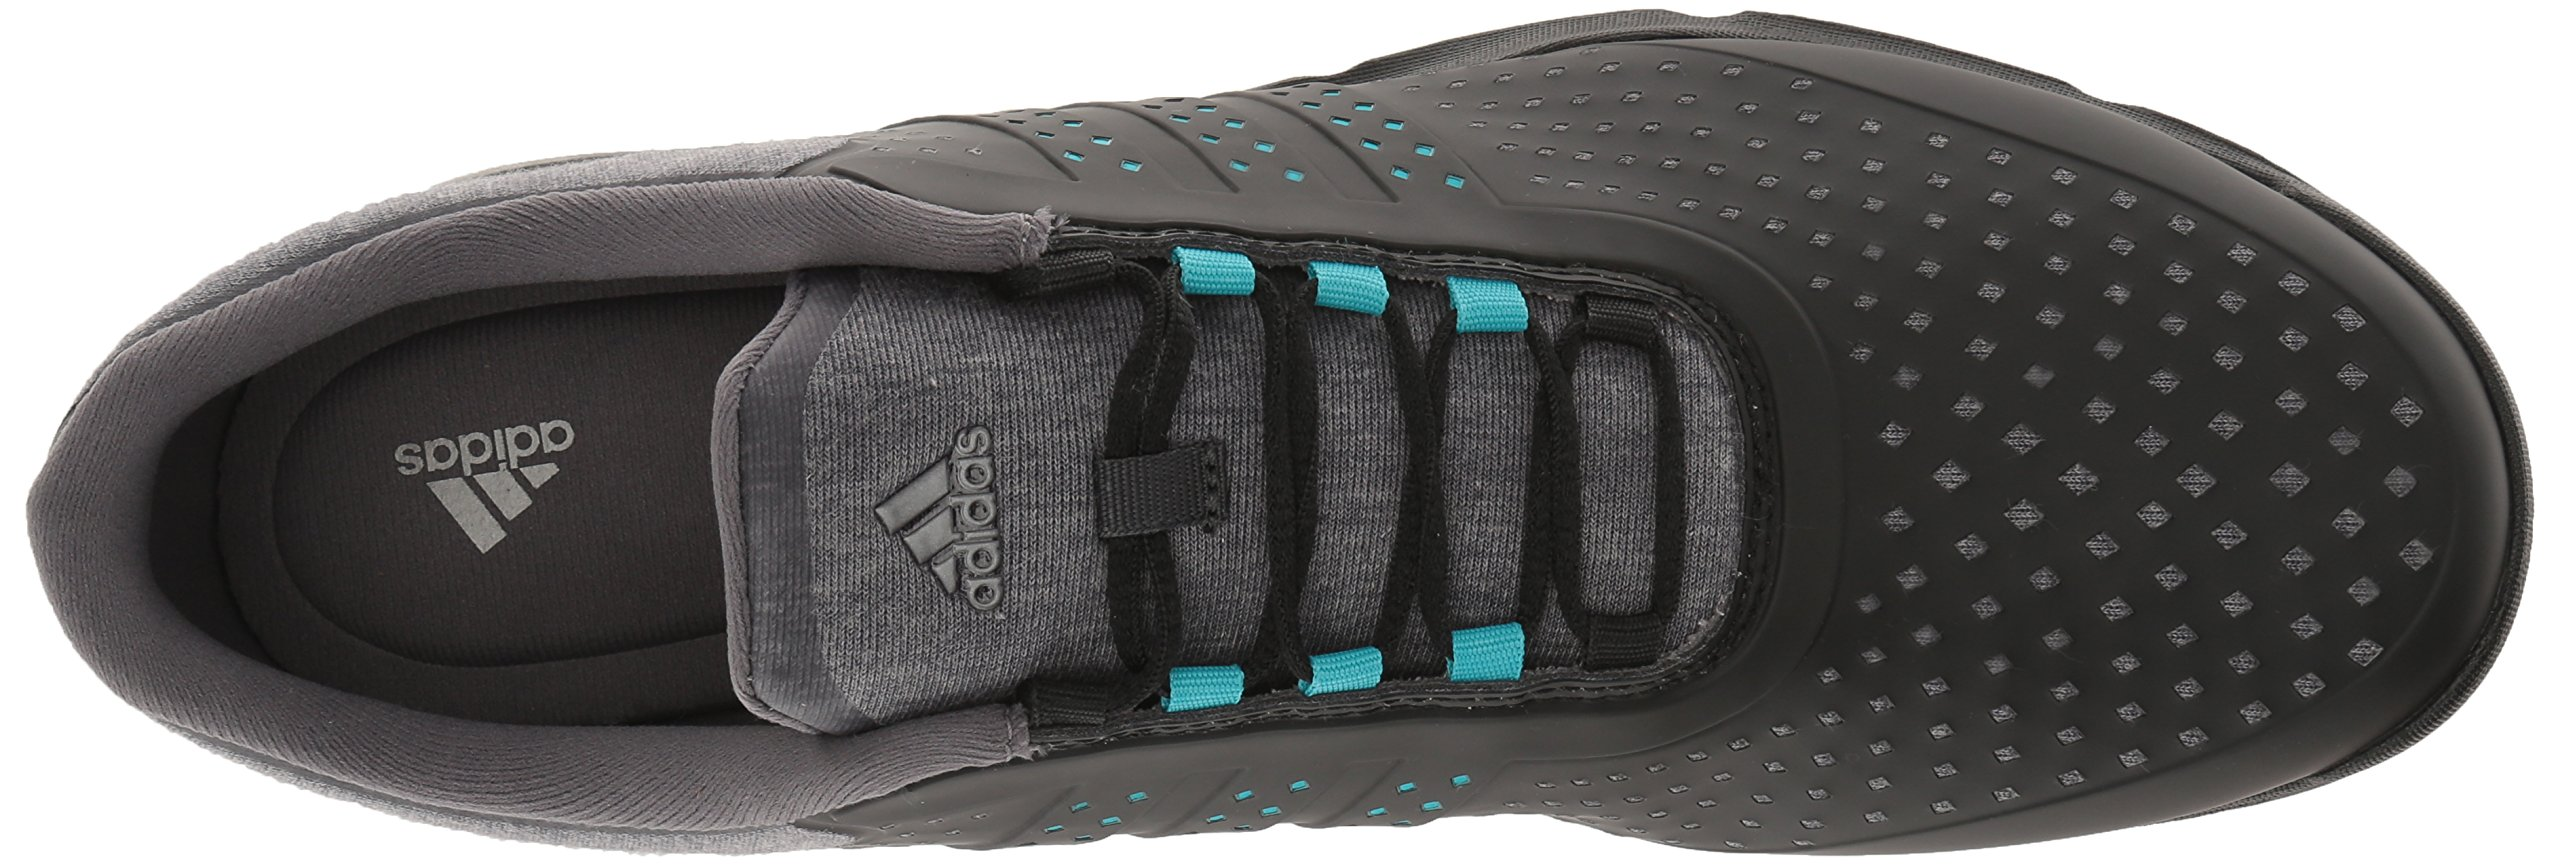 adidas Women's Adipure Sport Golf Shoe, Grey, 7 M US by adidas (Image #8)